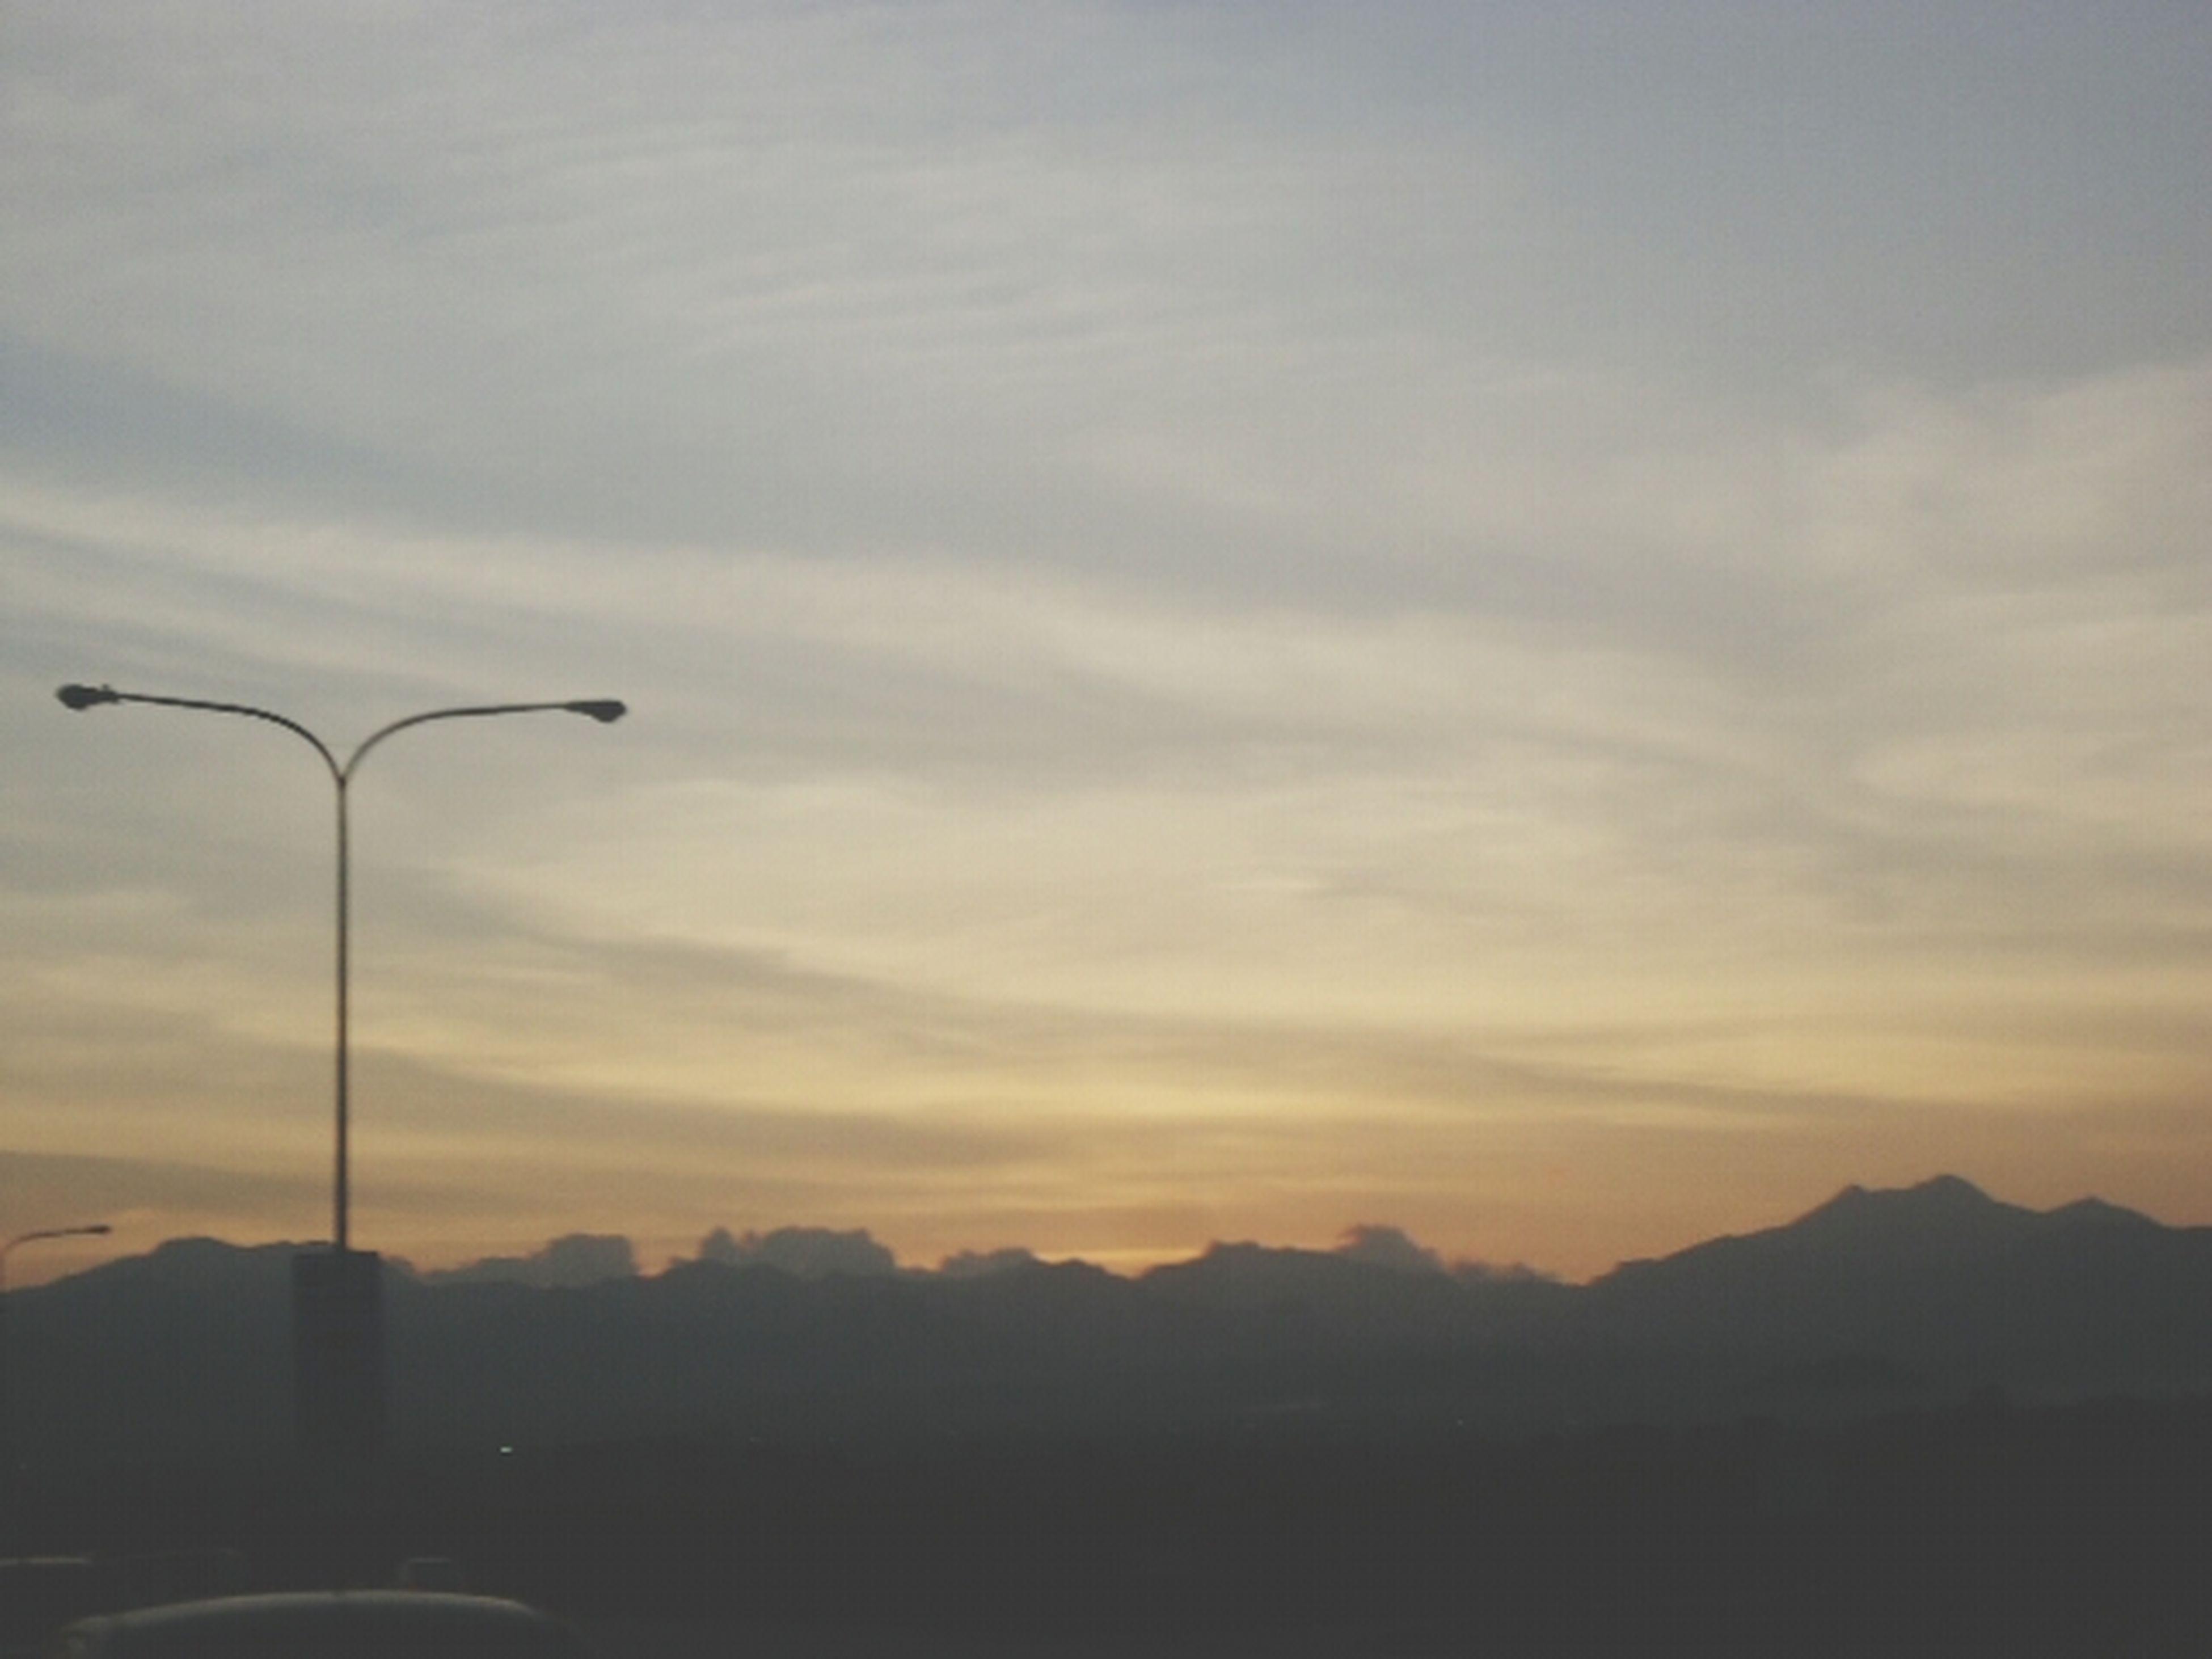 mountain, sky, sunset, street light, cloud - sky, scenics, silhouette, tranquility, mountain range, beauty in nature, tranquil scene, transportation, nature, lighting equipment, landscape, cloud, dusk, road, outdoors, idyllic